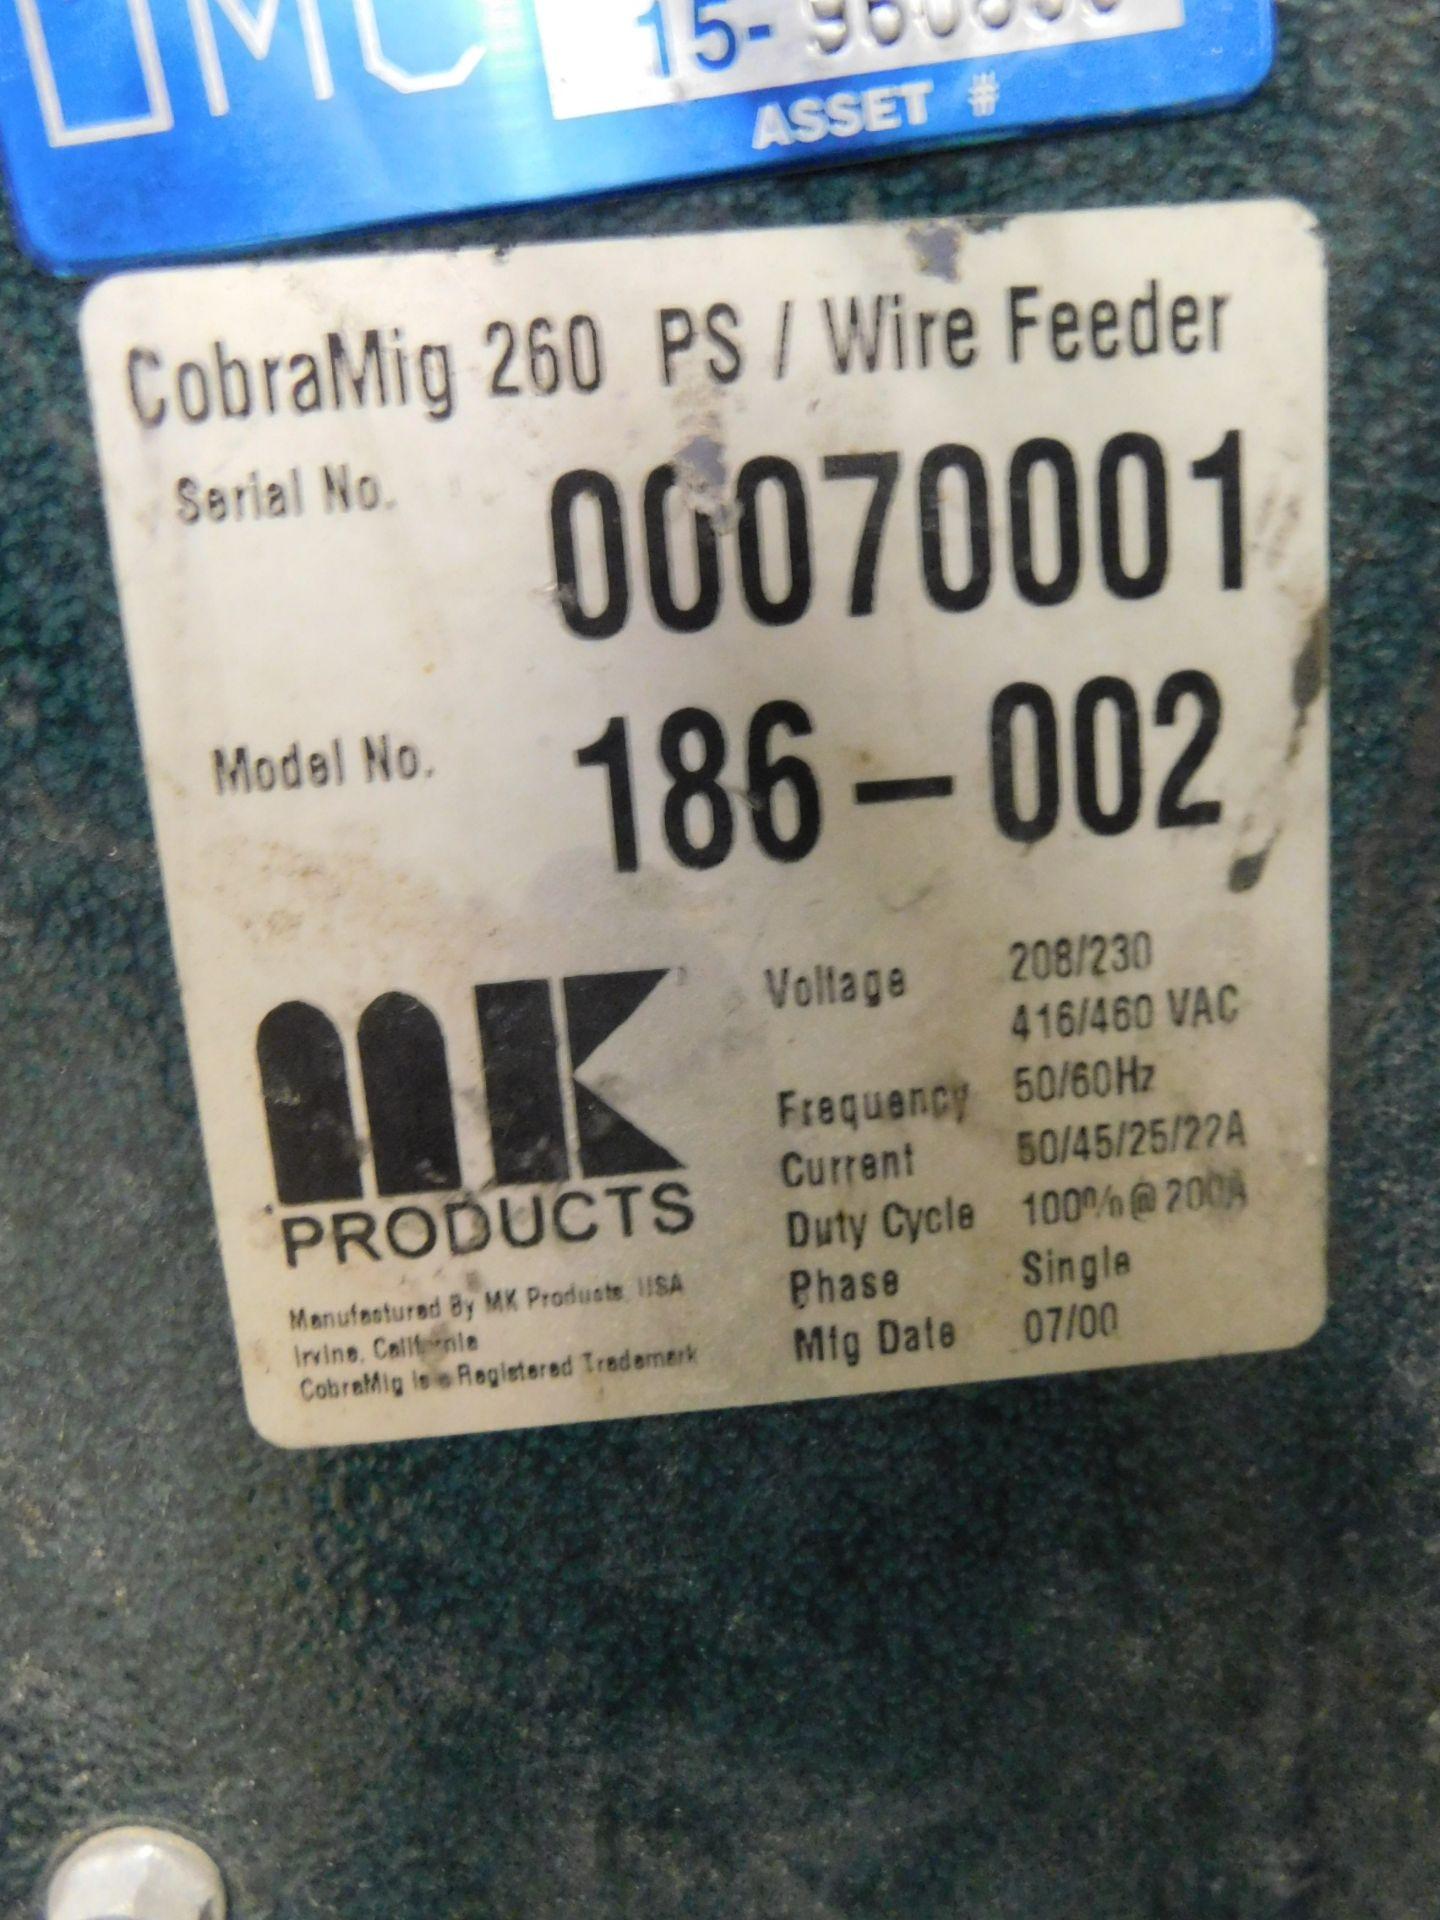 Lot 8 - Cobra Mig 20 Mig Welder, SN 00070001, Mig Gun, 208/230V, 1 phase, Lot Location: 301 Poor Dr.,